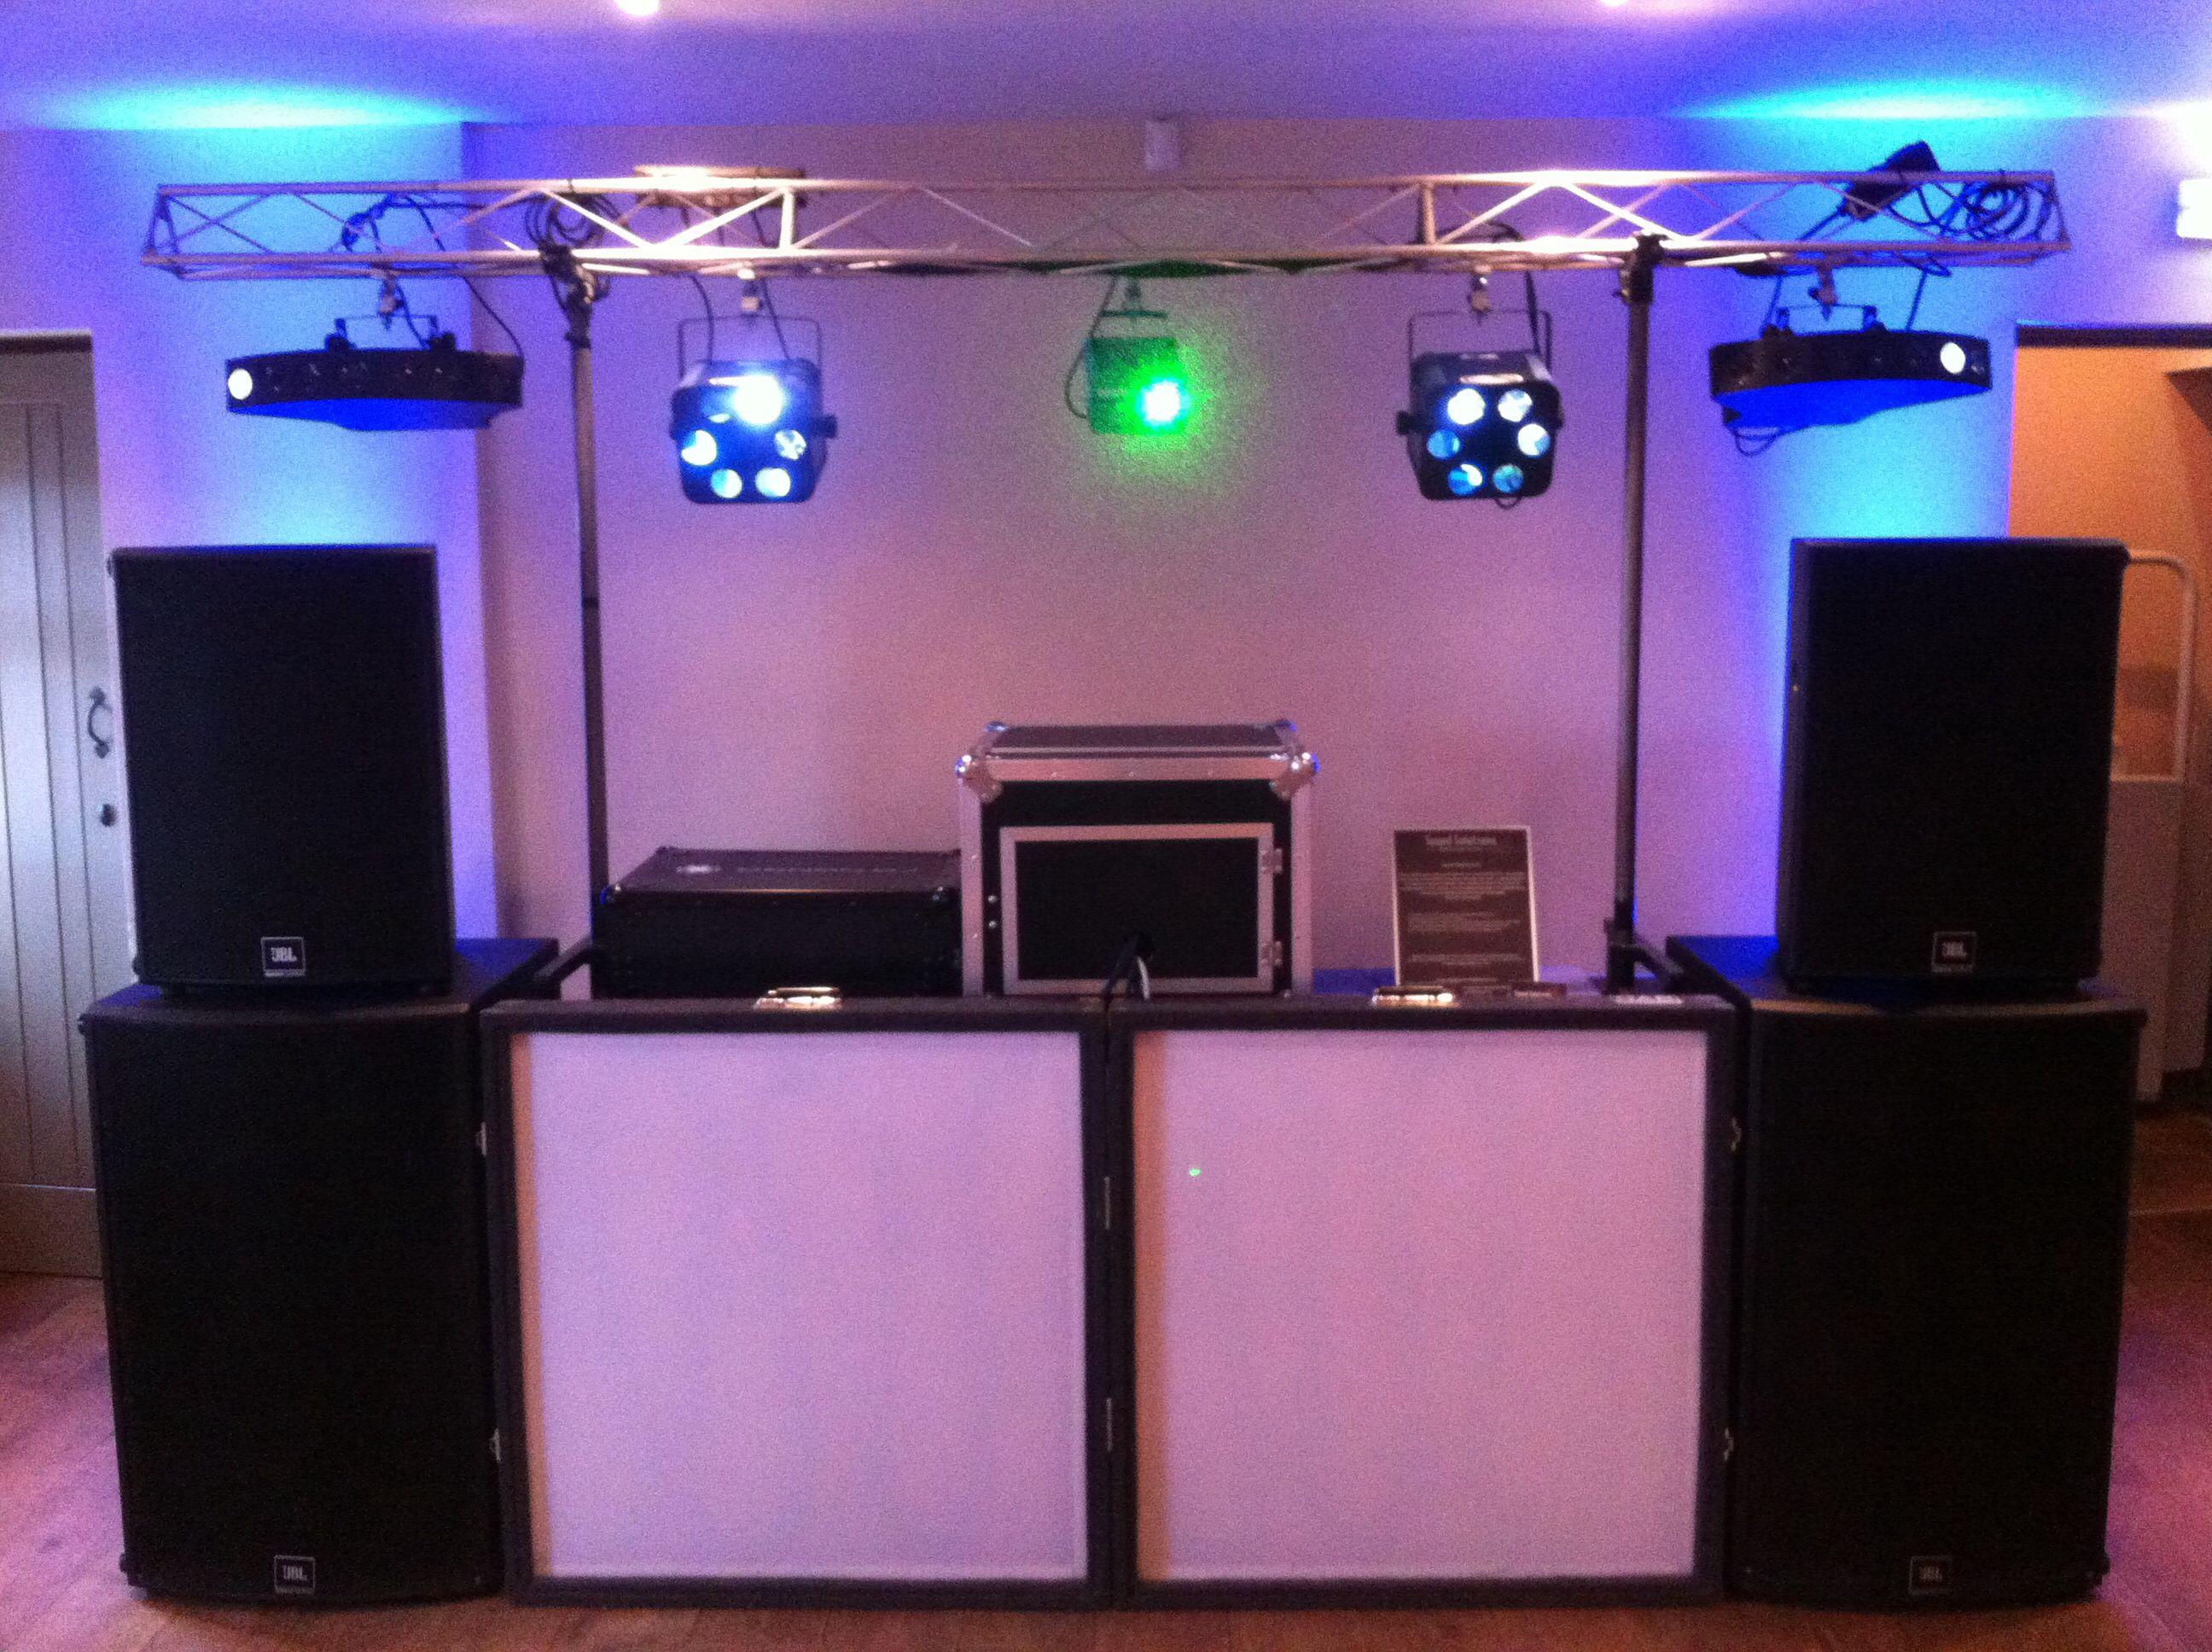 Wedding Dj Setup | Play That Funky Music | Dj setup, Wedding dj